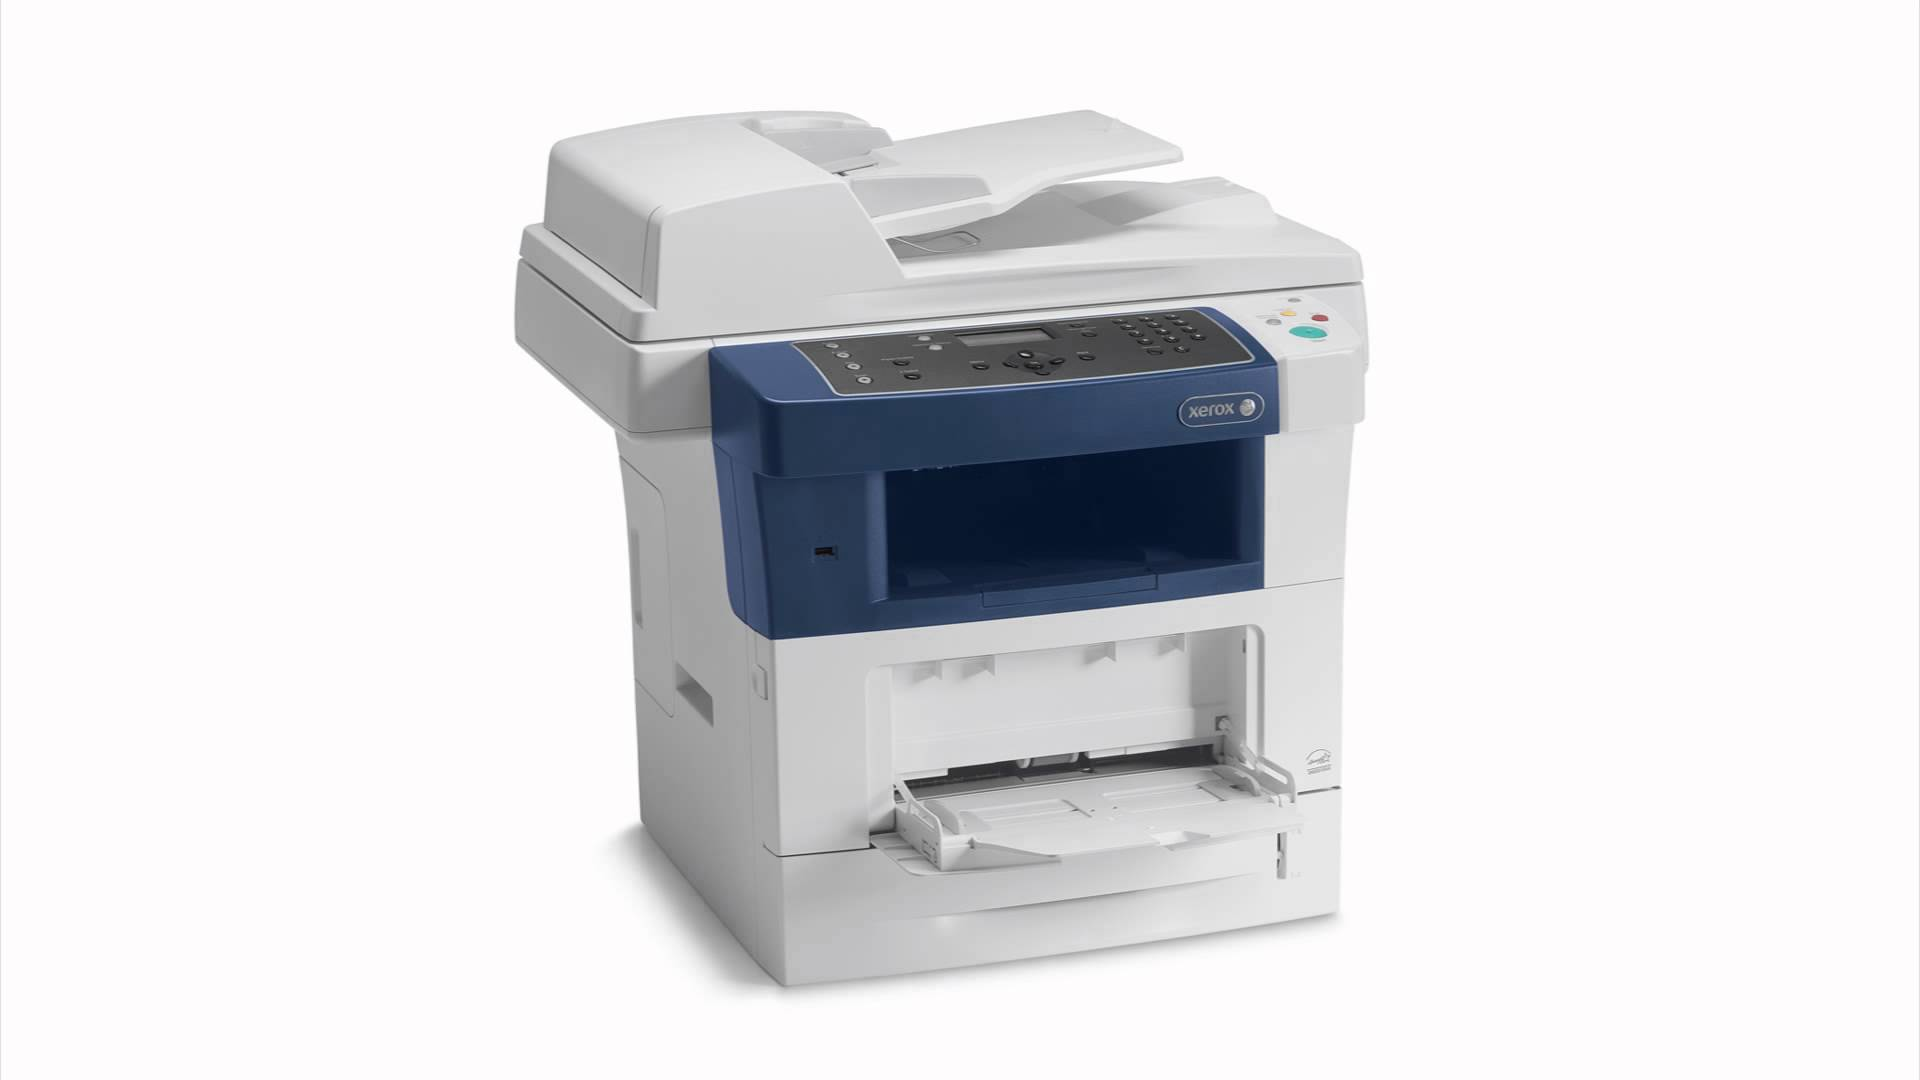 Fuji Xerox WorkCentre 3550 Laser Printer